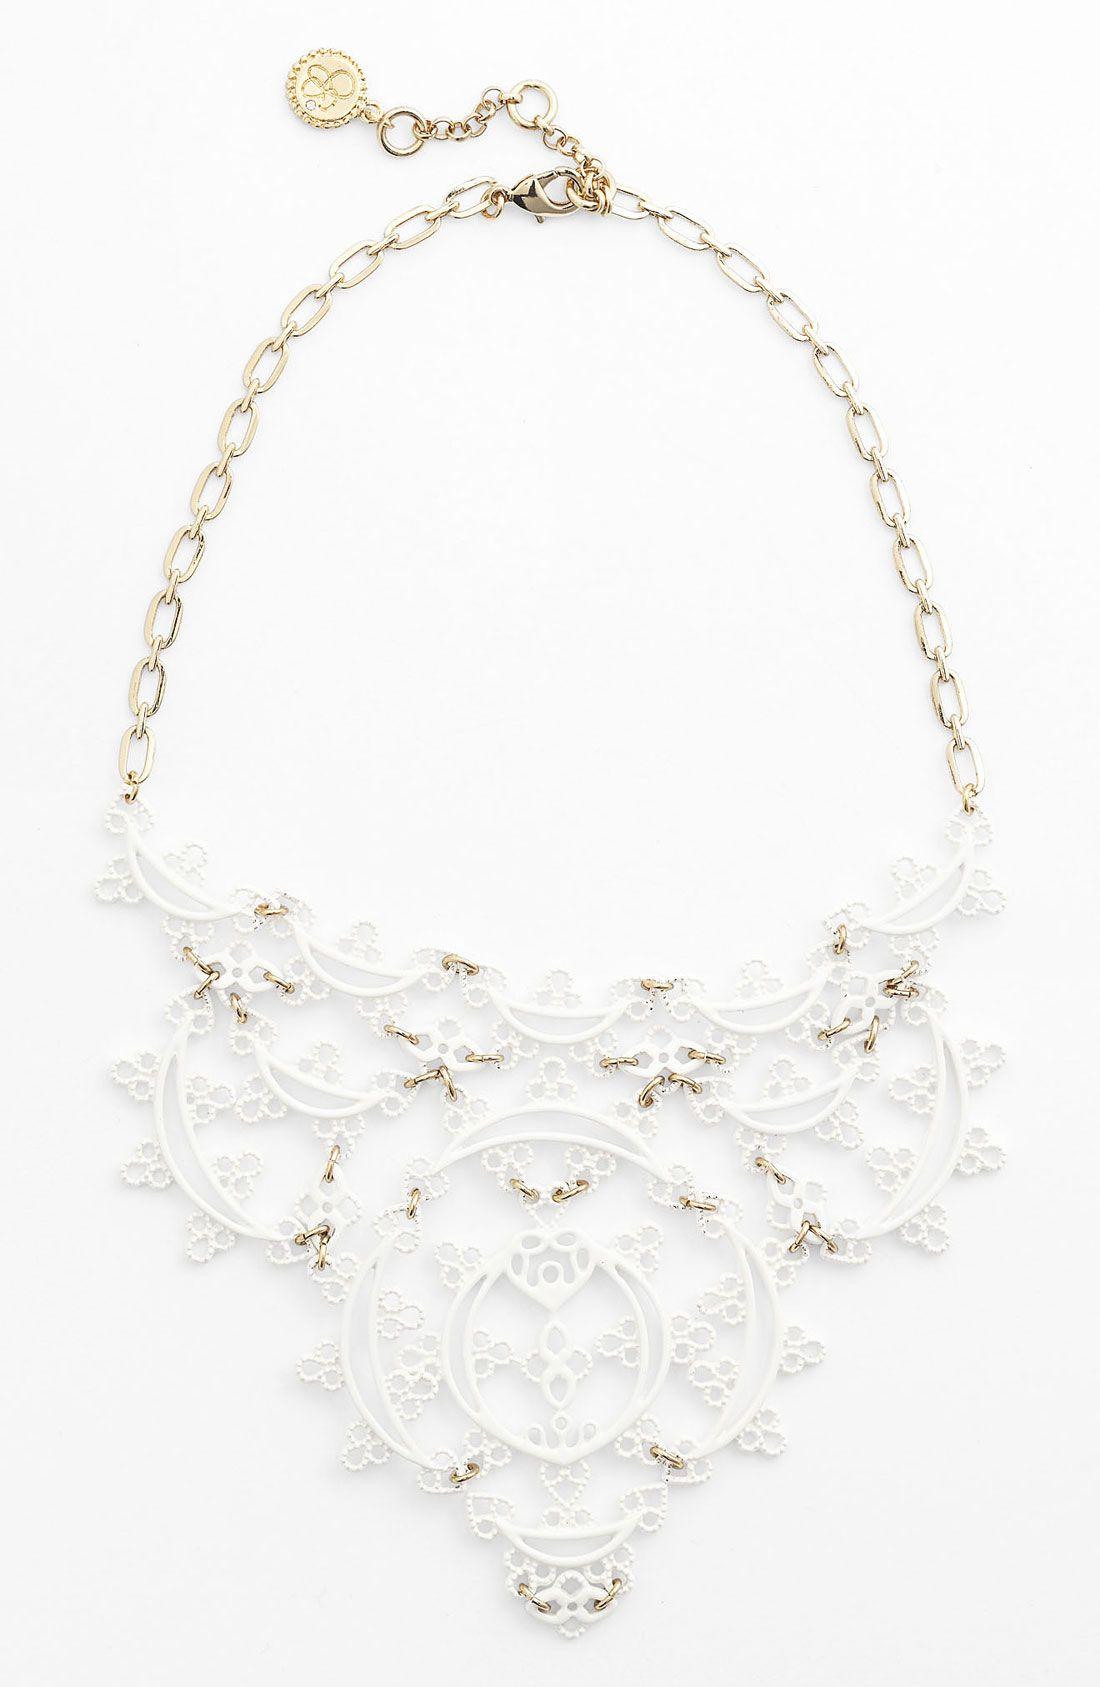 Jessica simpson lacey bib necklace nordstrom vintage